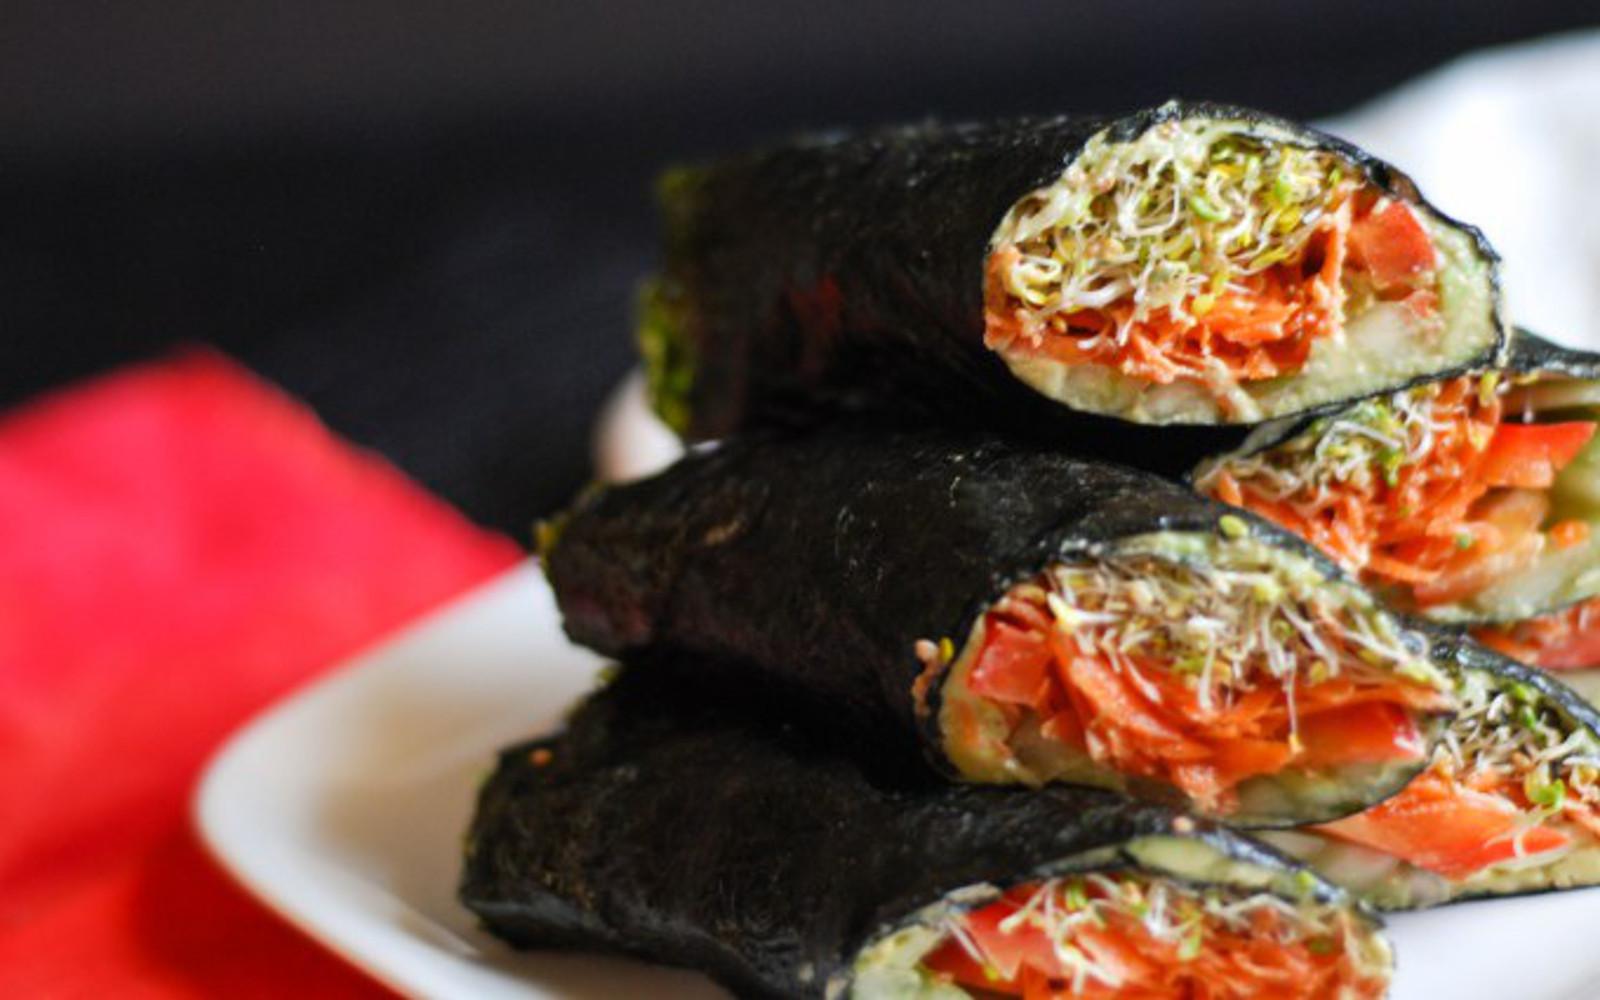 Nori Wraps With Creamy Avocado-Tahini Spread